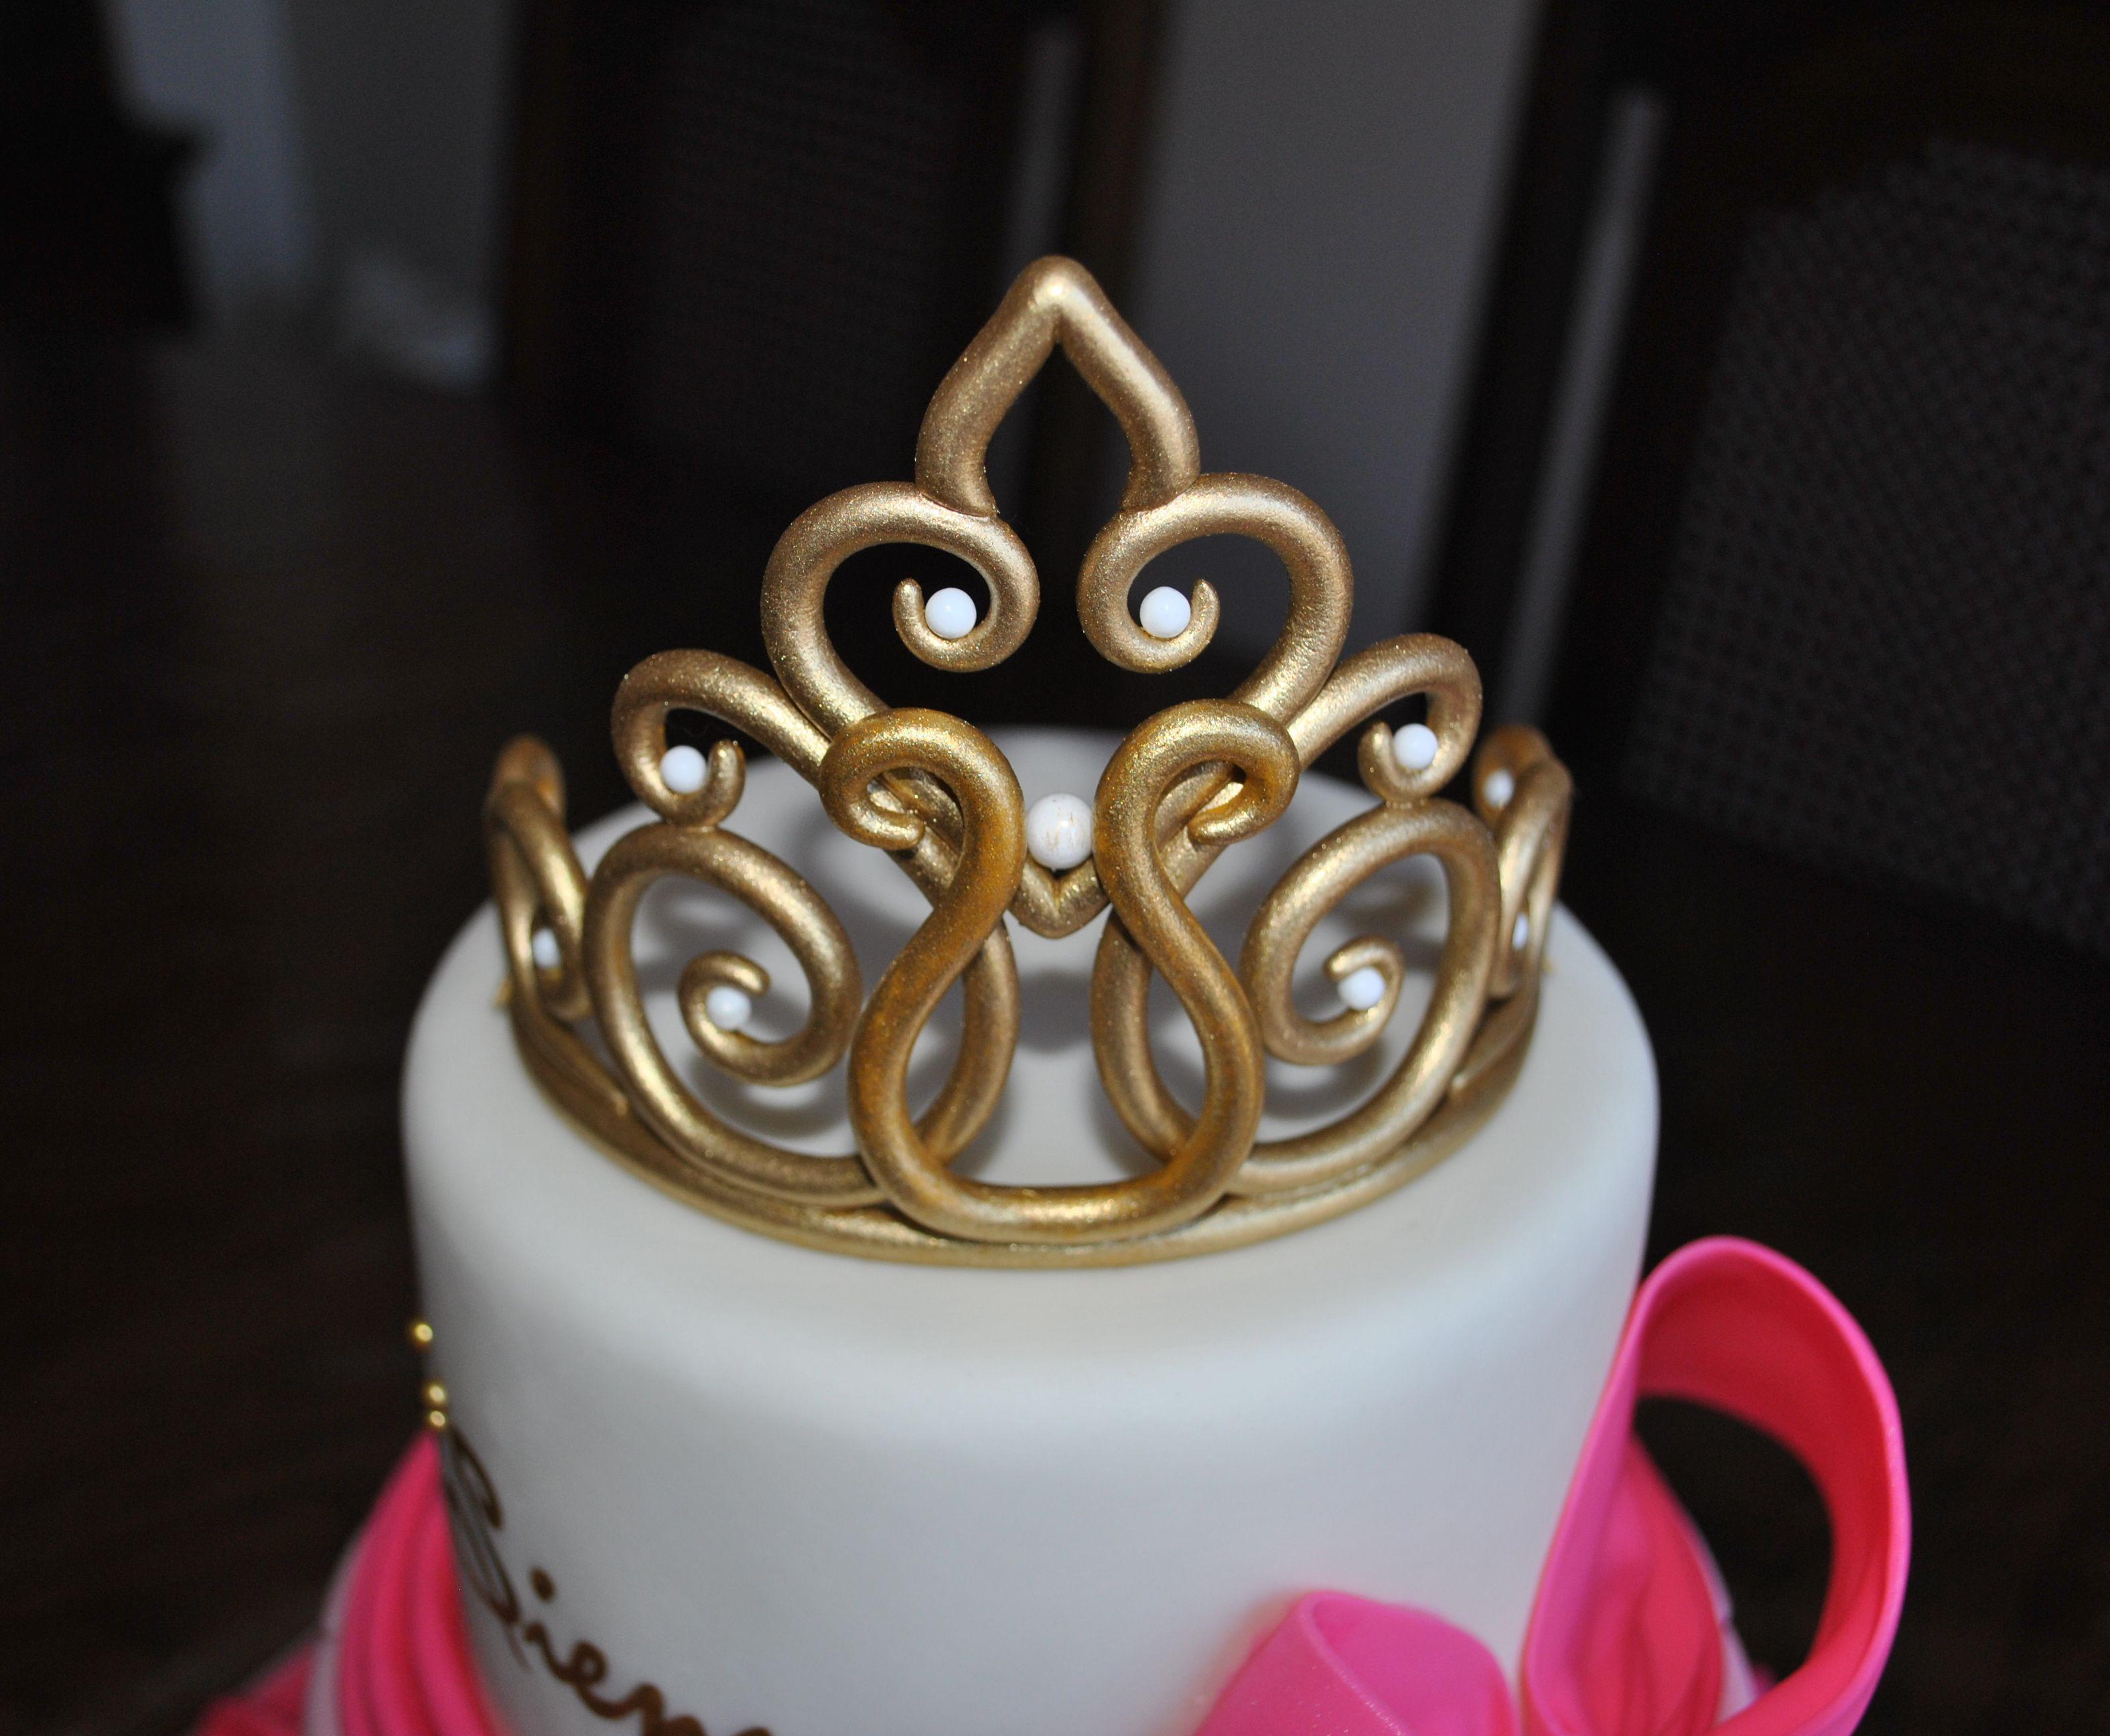 Gold Gumpaste Tiara